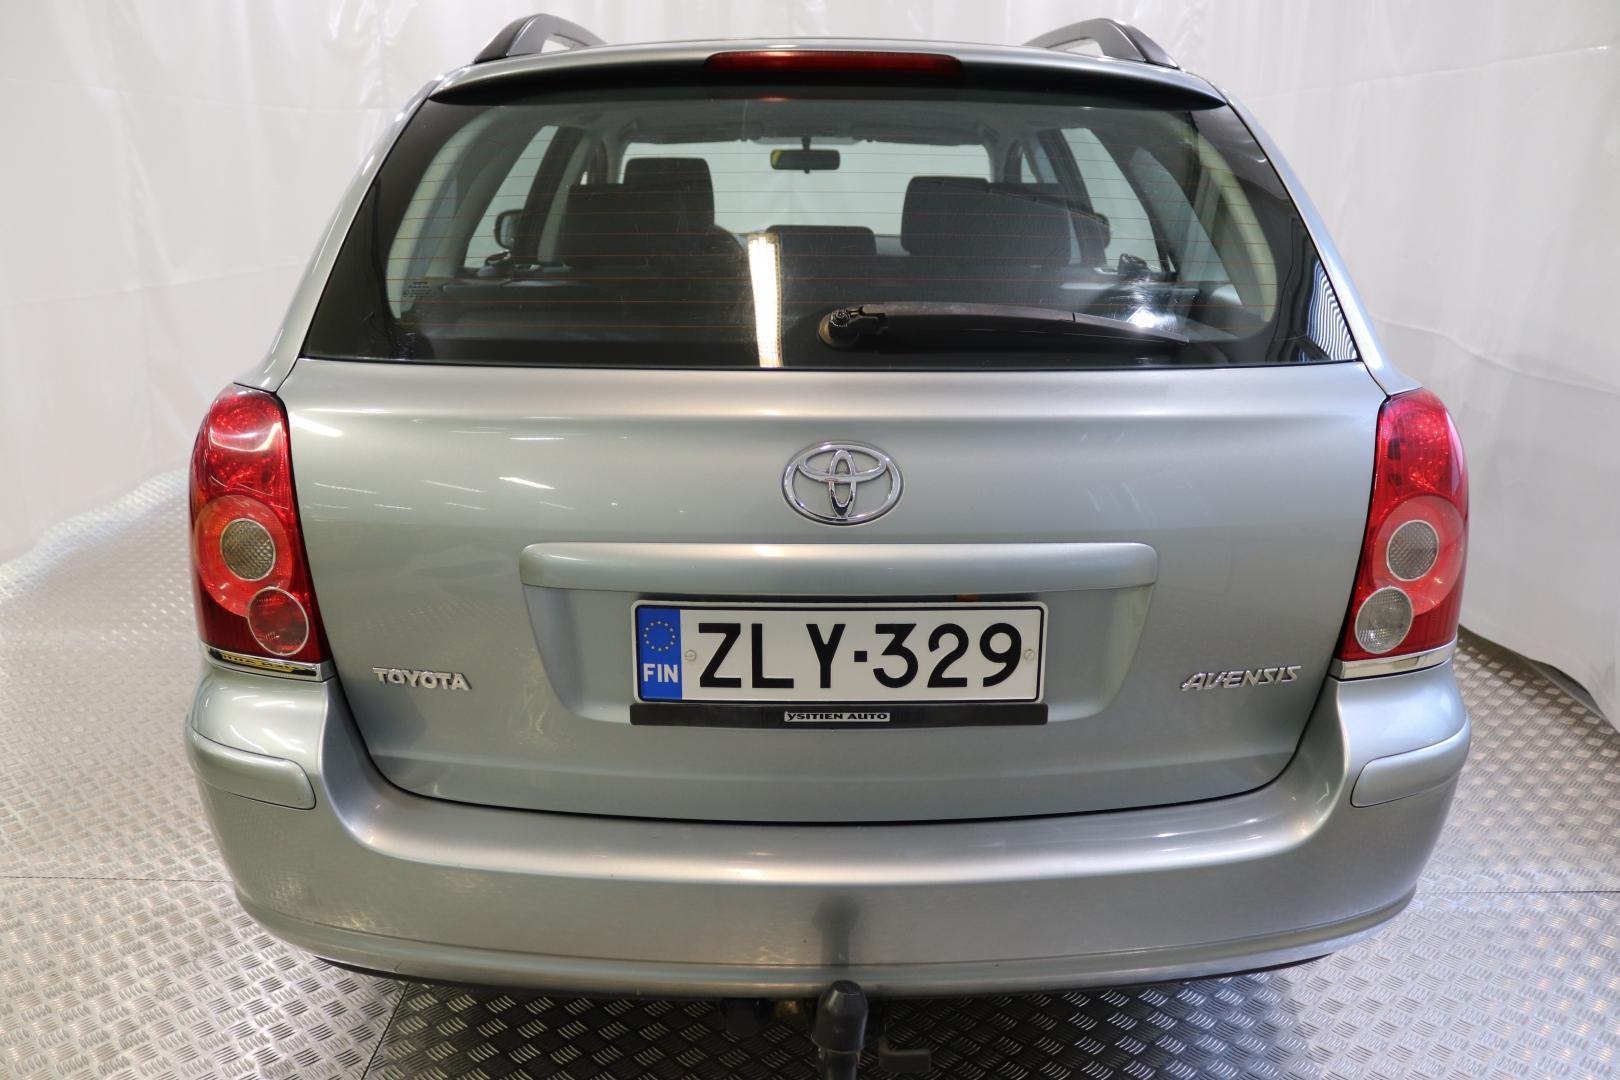 Toyota Avensis, 1.6 VVT-i Linea Terra Wagon